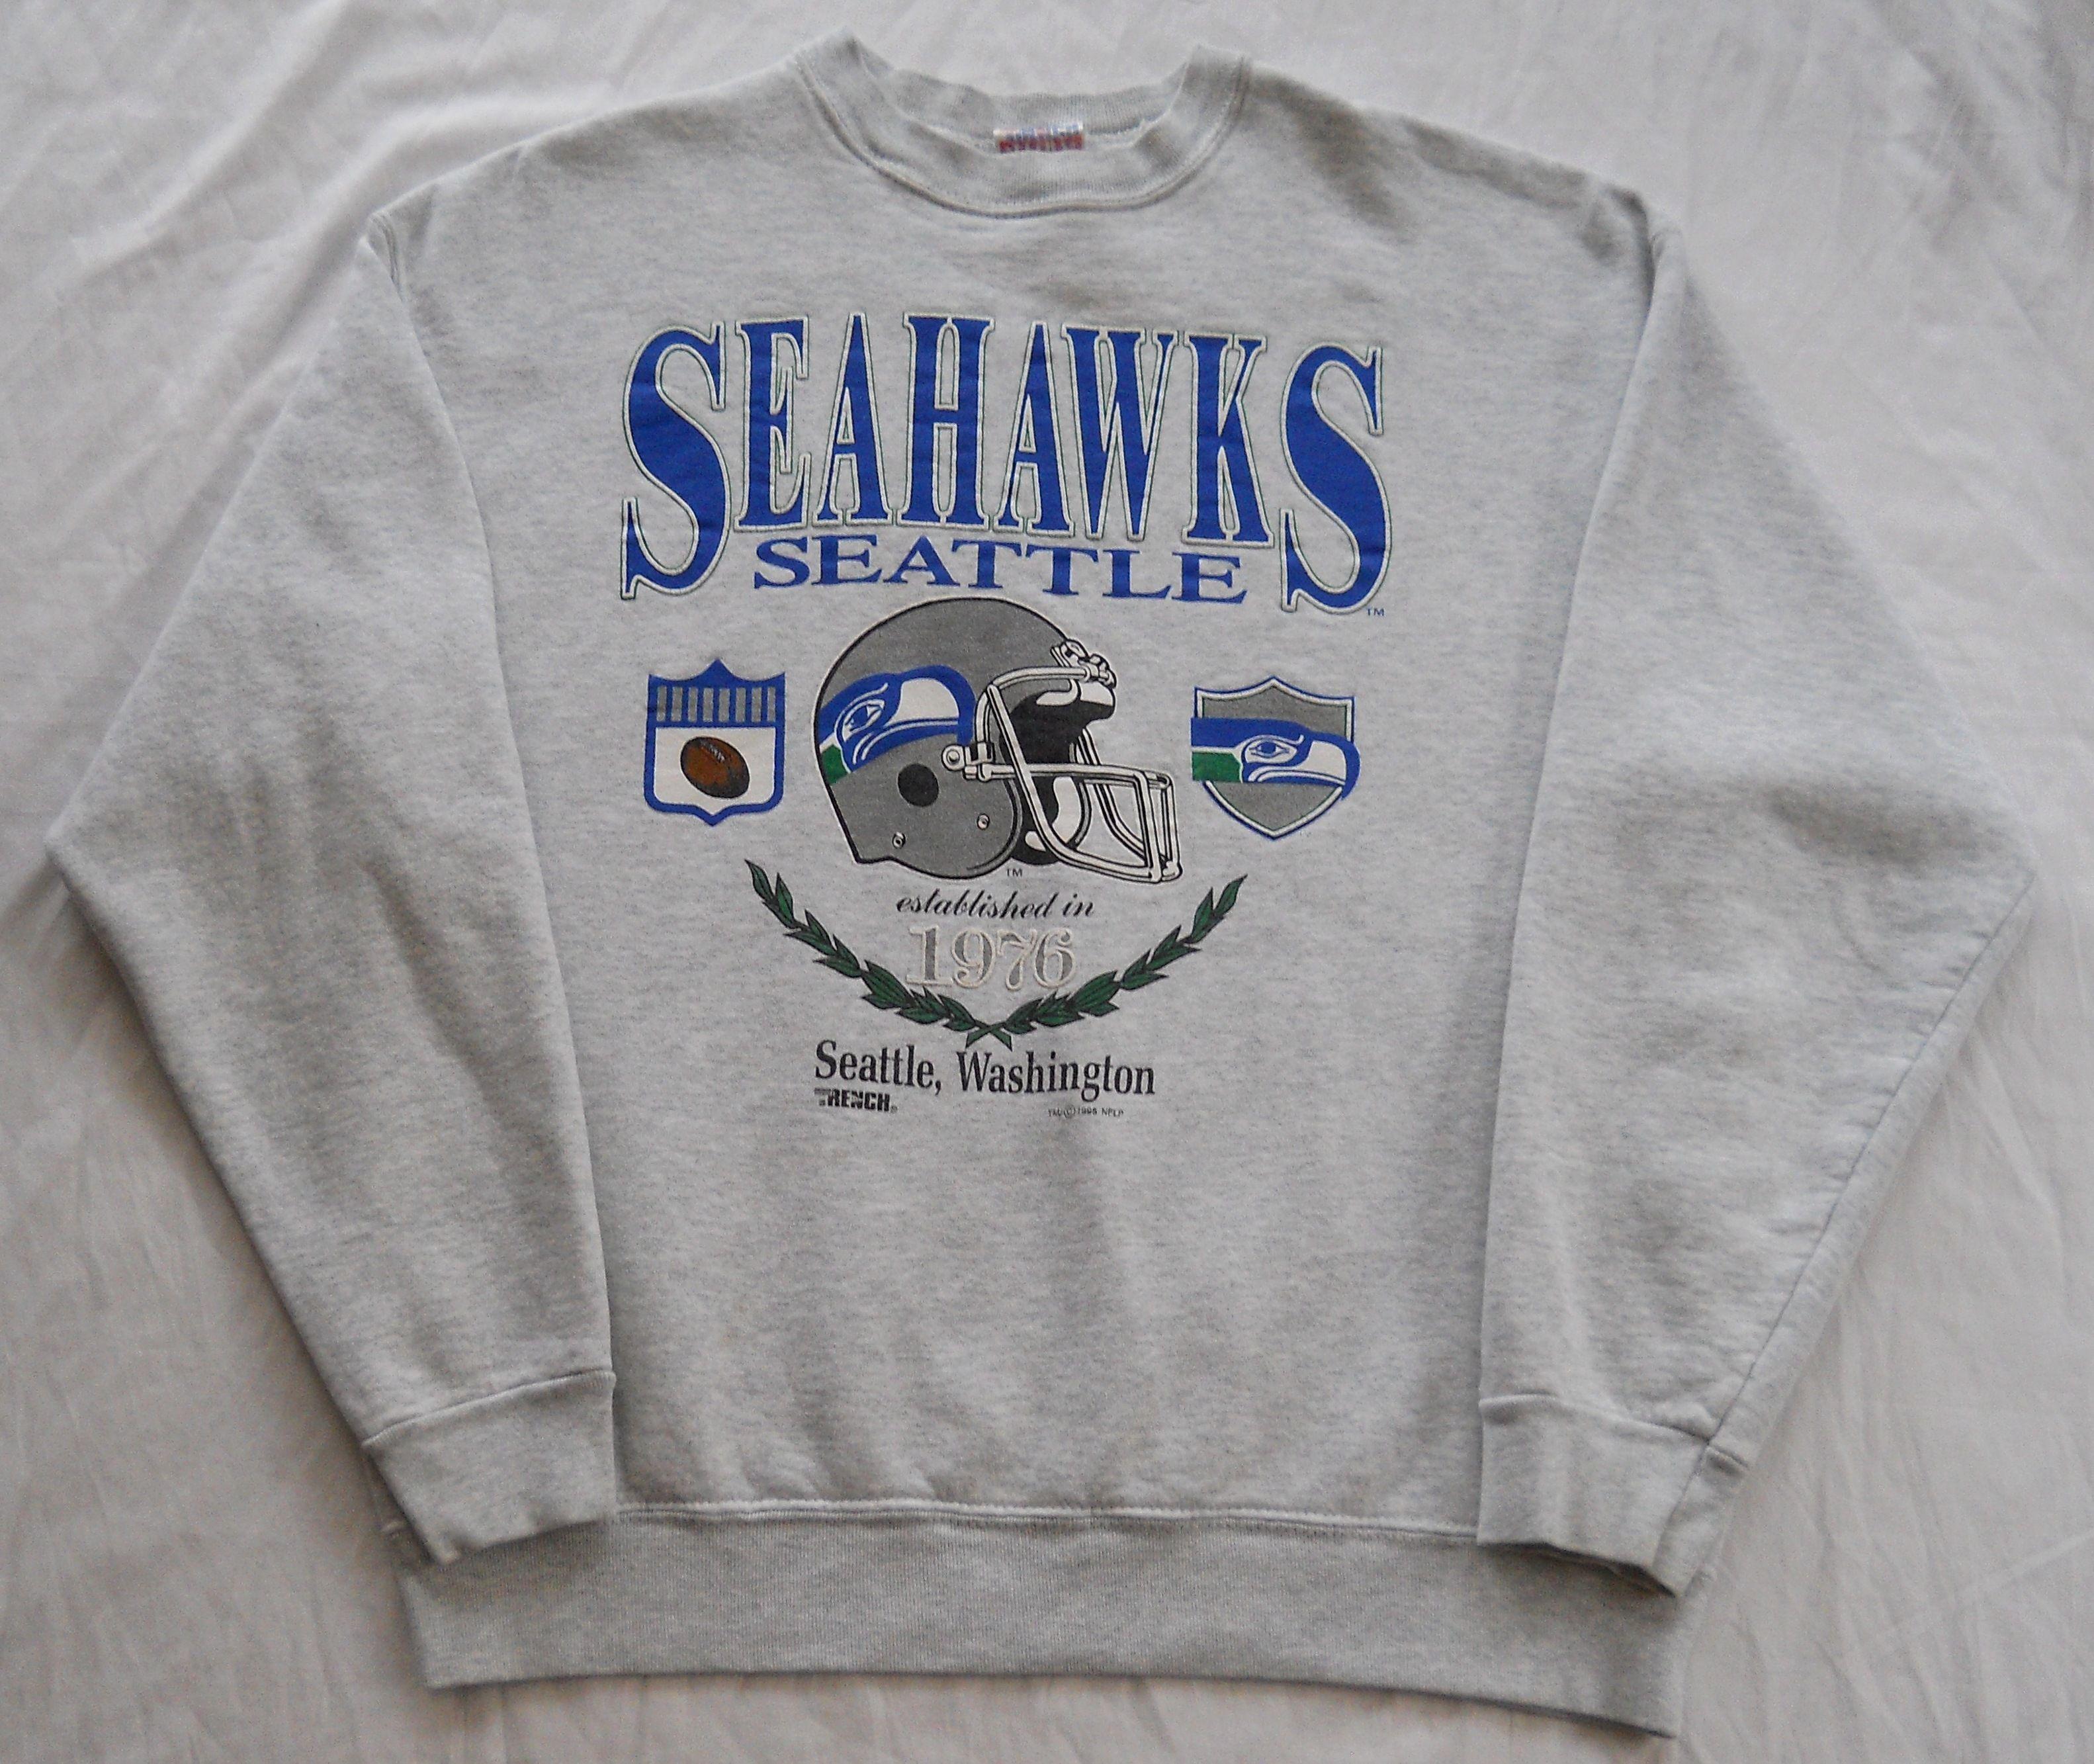 Predownload: Vintage 1995 Seattle Seahawks Sweatshirt By Trench Men S Xl Pre Owned Seahawks Sweatshirt Sweatshirts Seattle Seahawks Sweatshirt [ 2666 x 3165 Pixel ]